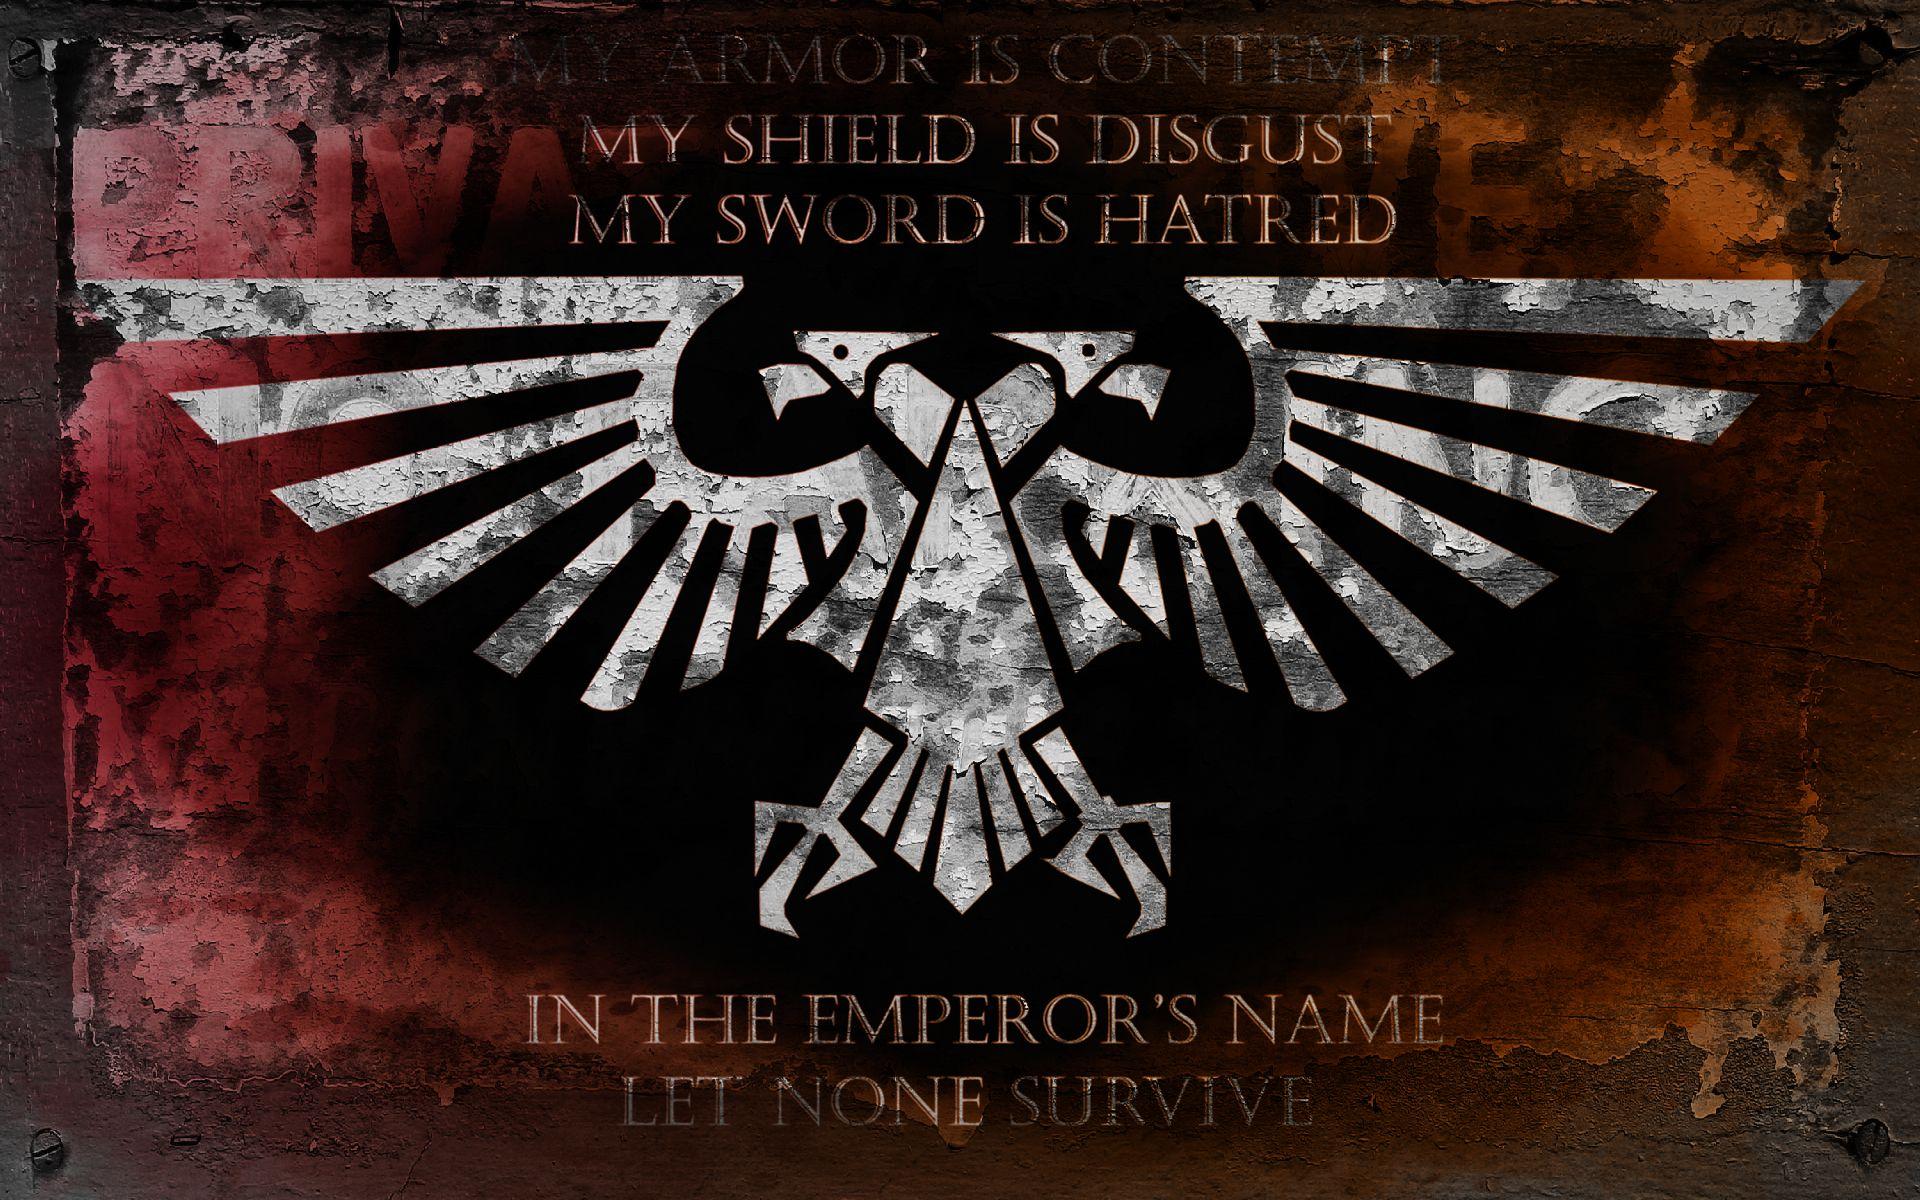 Imperial Guard Quotes Image Warhammer 40k Tyranids Group Mod Warhammer Pinterest Warhammer